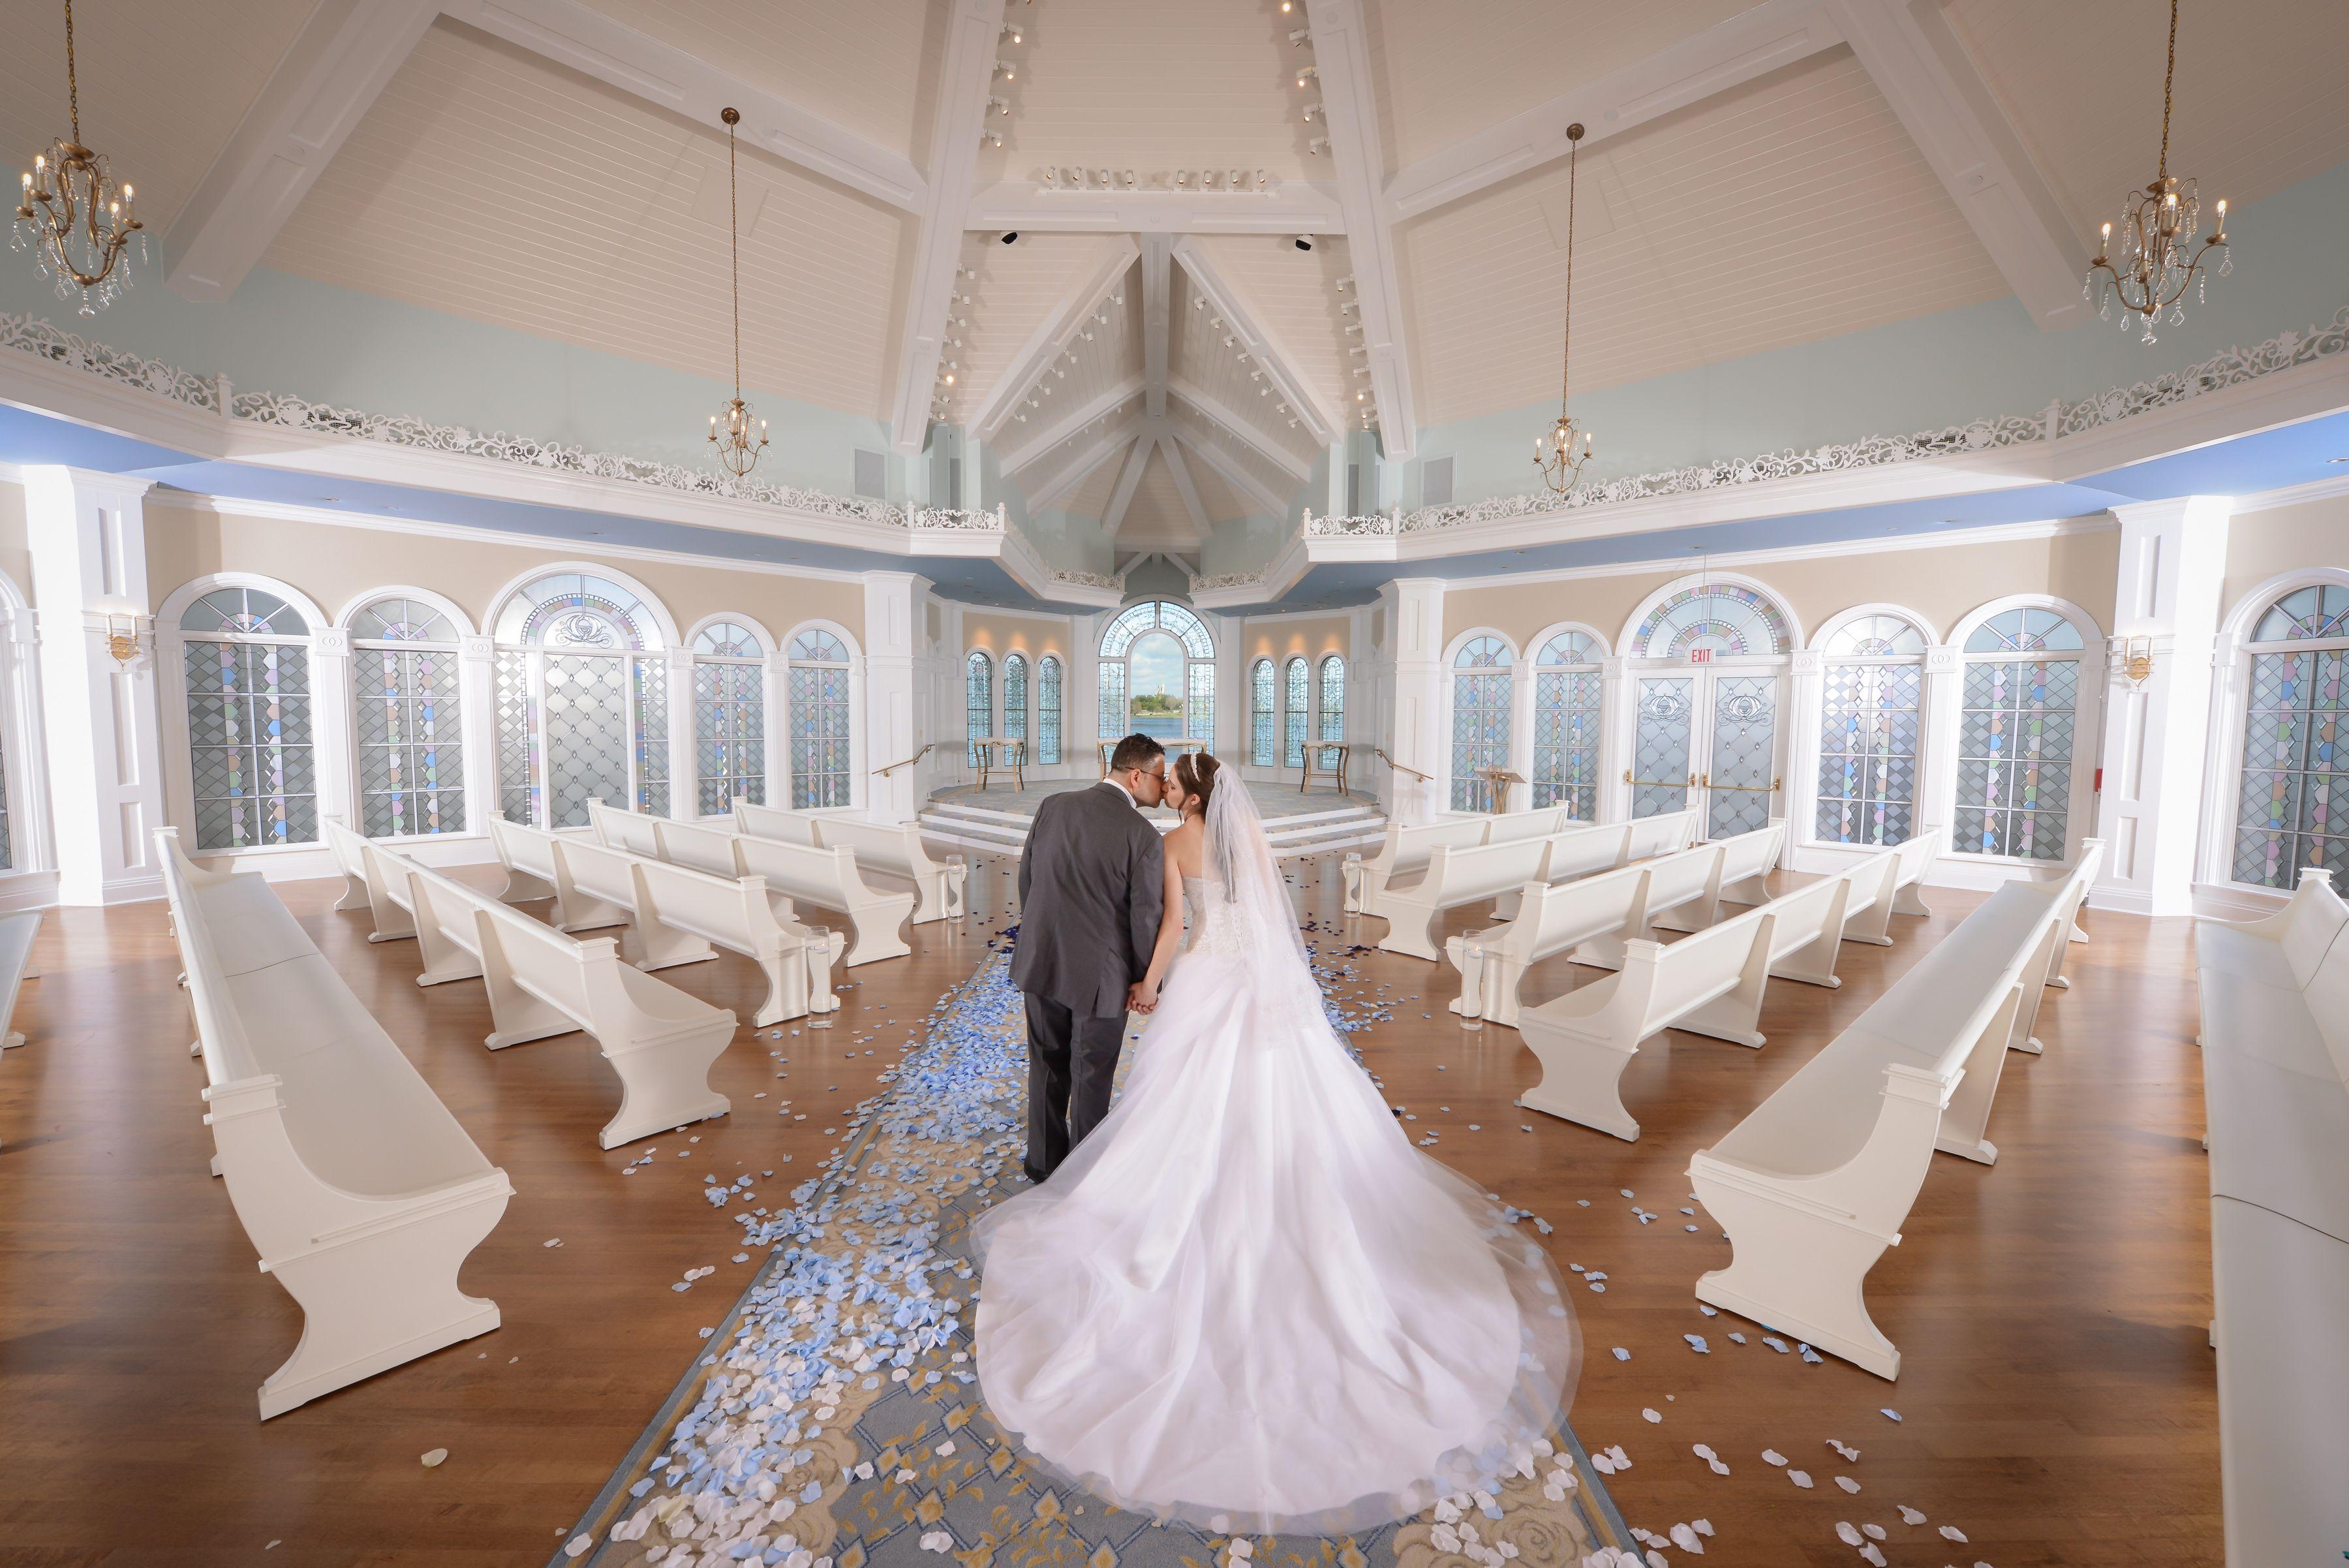 The Dazzling New Wedding Pavilion Shines During This Portrait Session Photo Jacob Disney